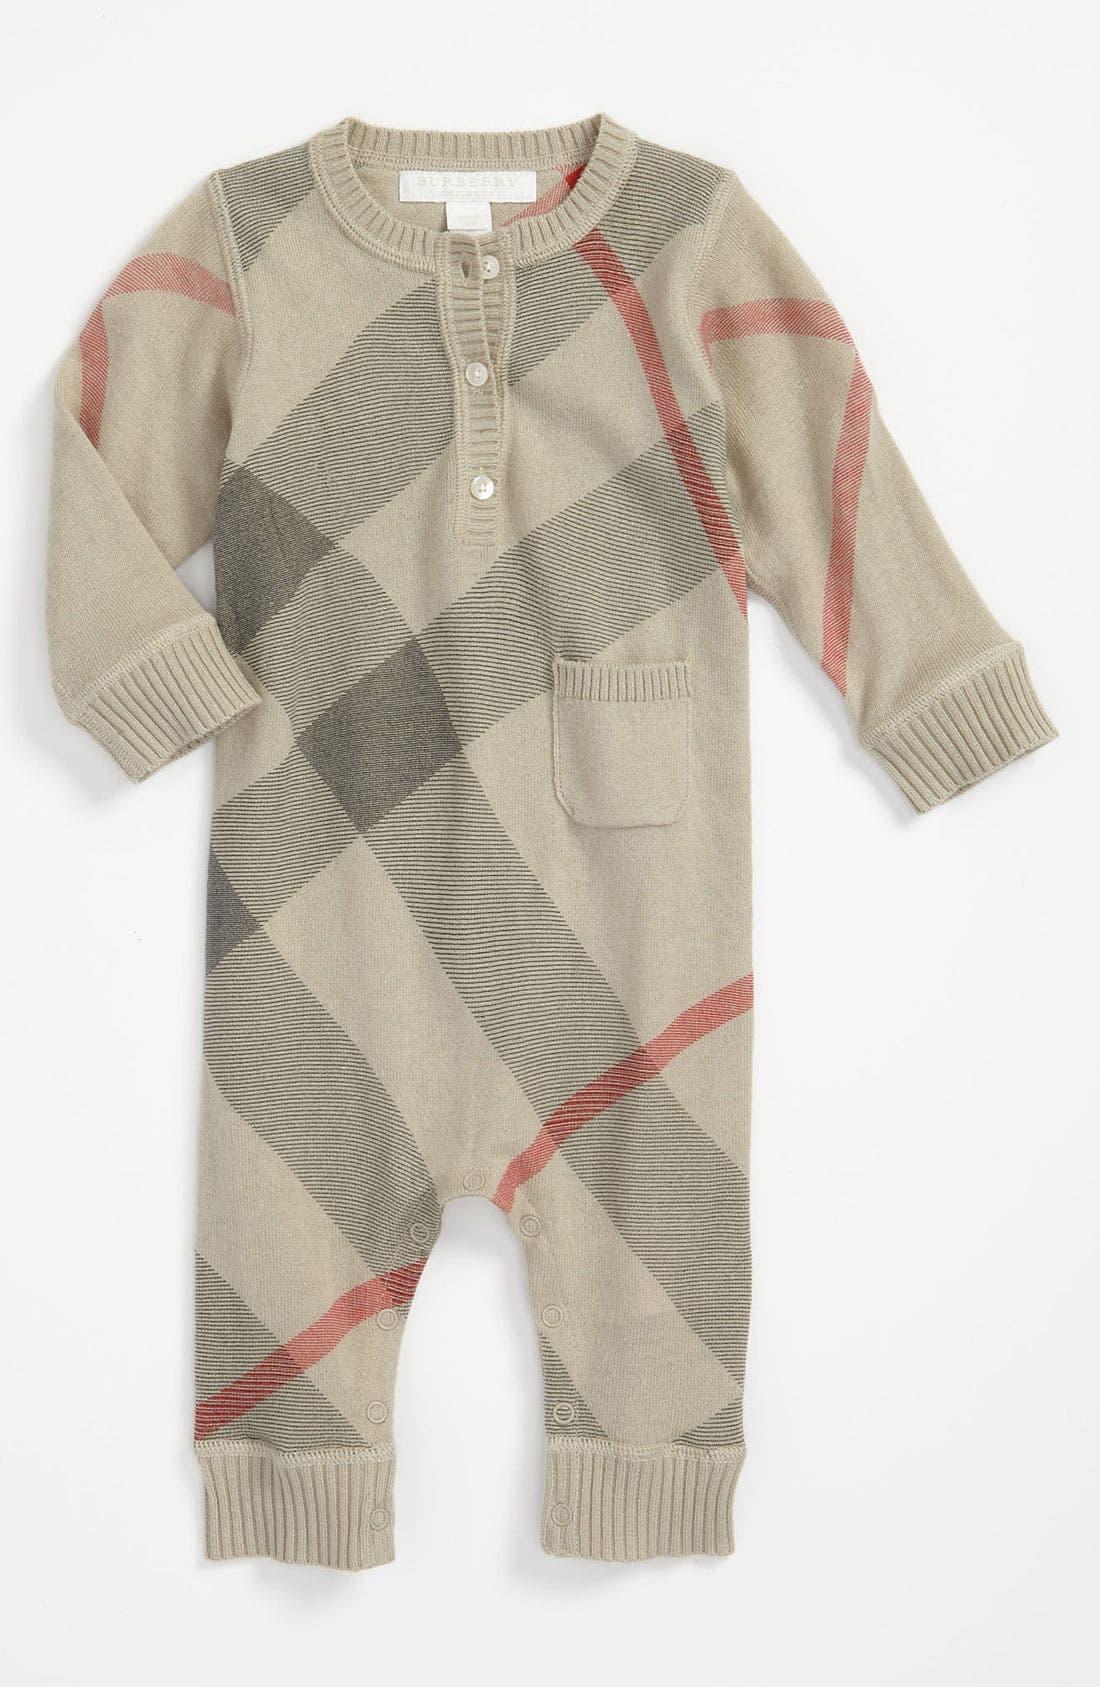 Main Image - Burberry Check Print Cashmere & Cotton Romper (Infant)